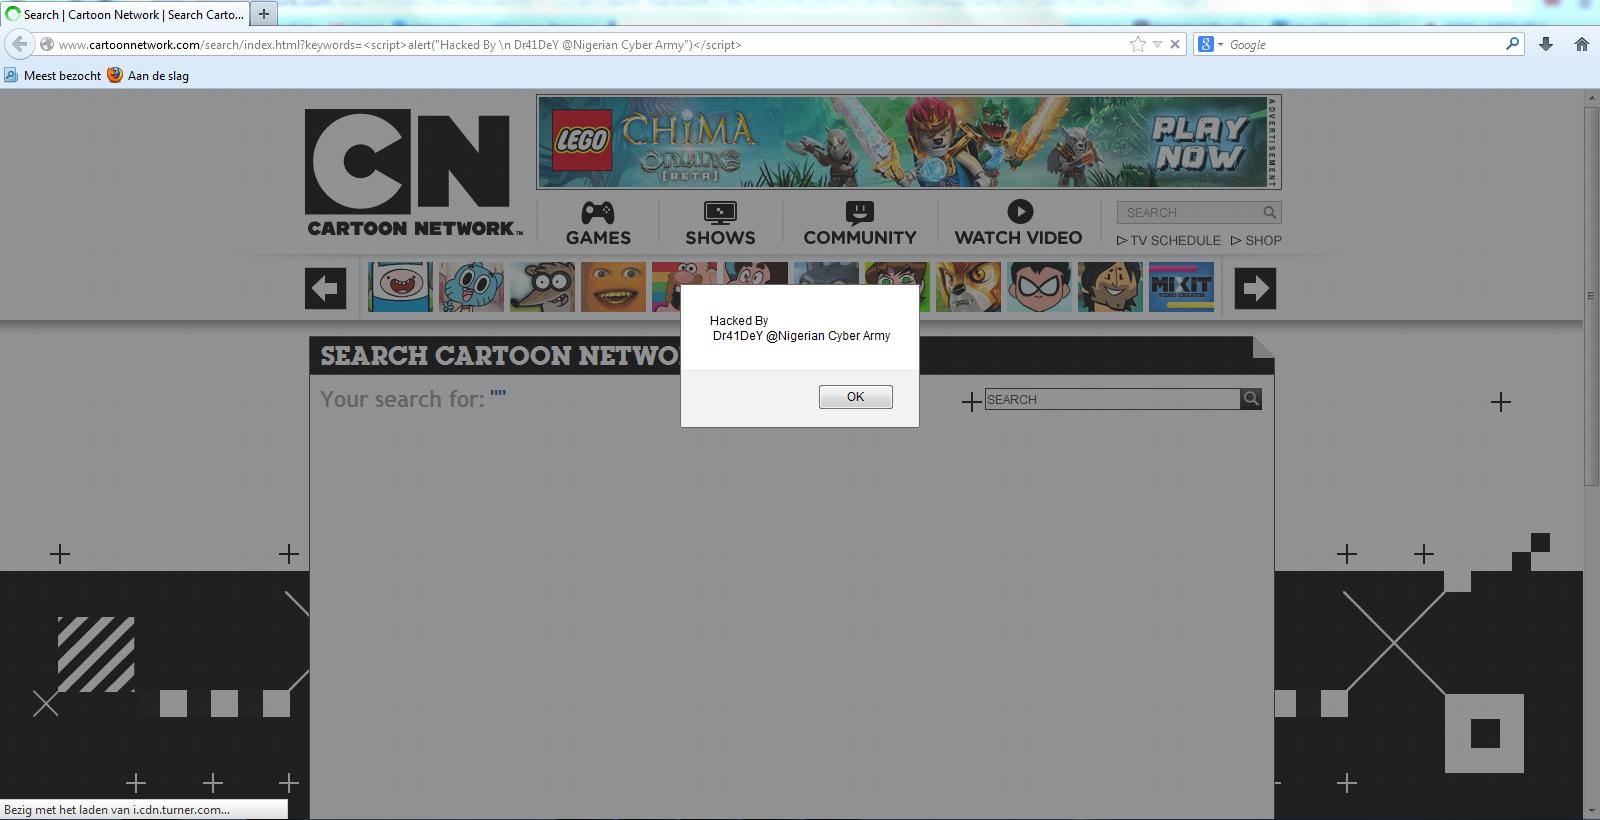 Vuln Pertamina Official Site: Cartoon Network (CN) Official Website Is Vulnerable To XSS